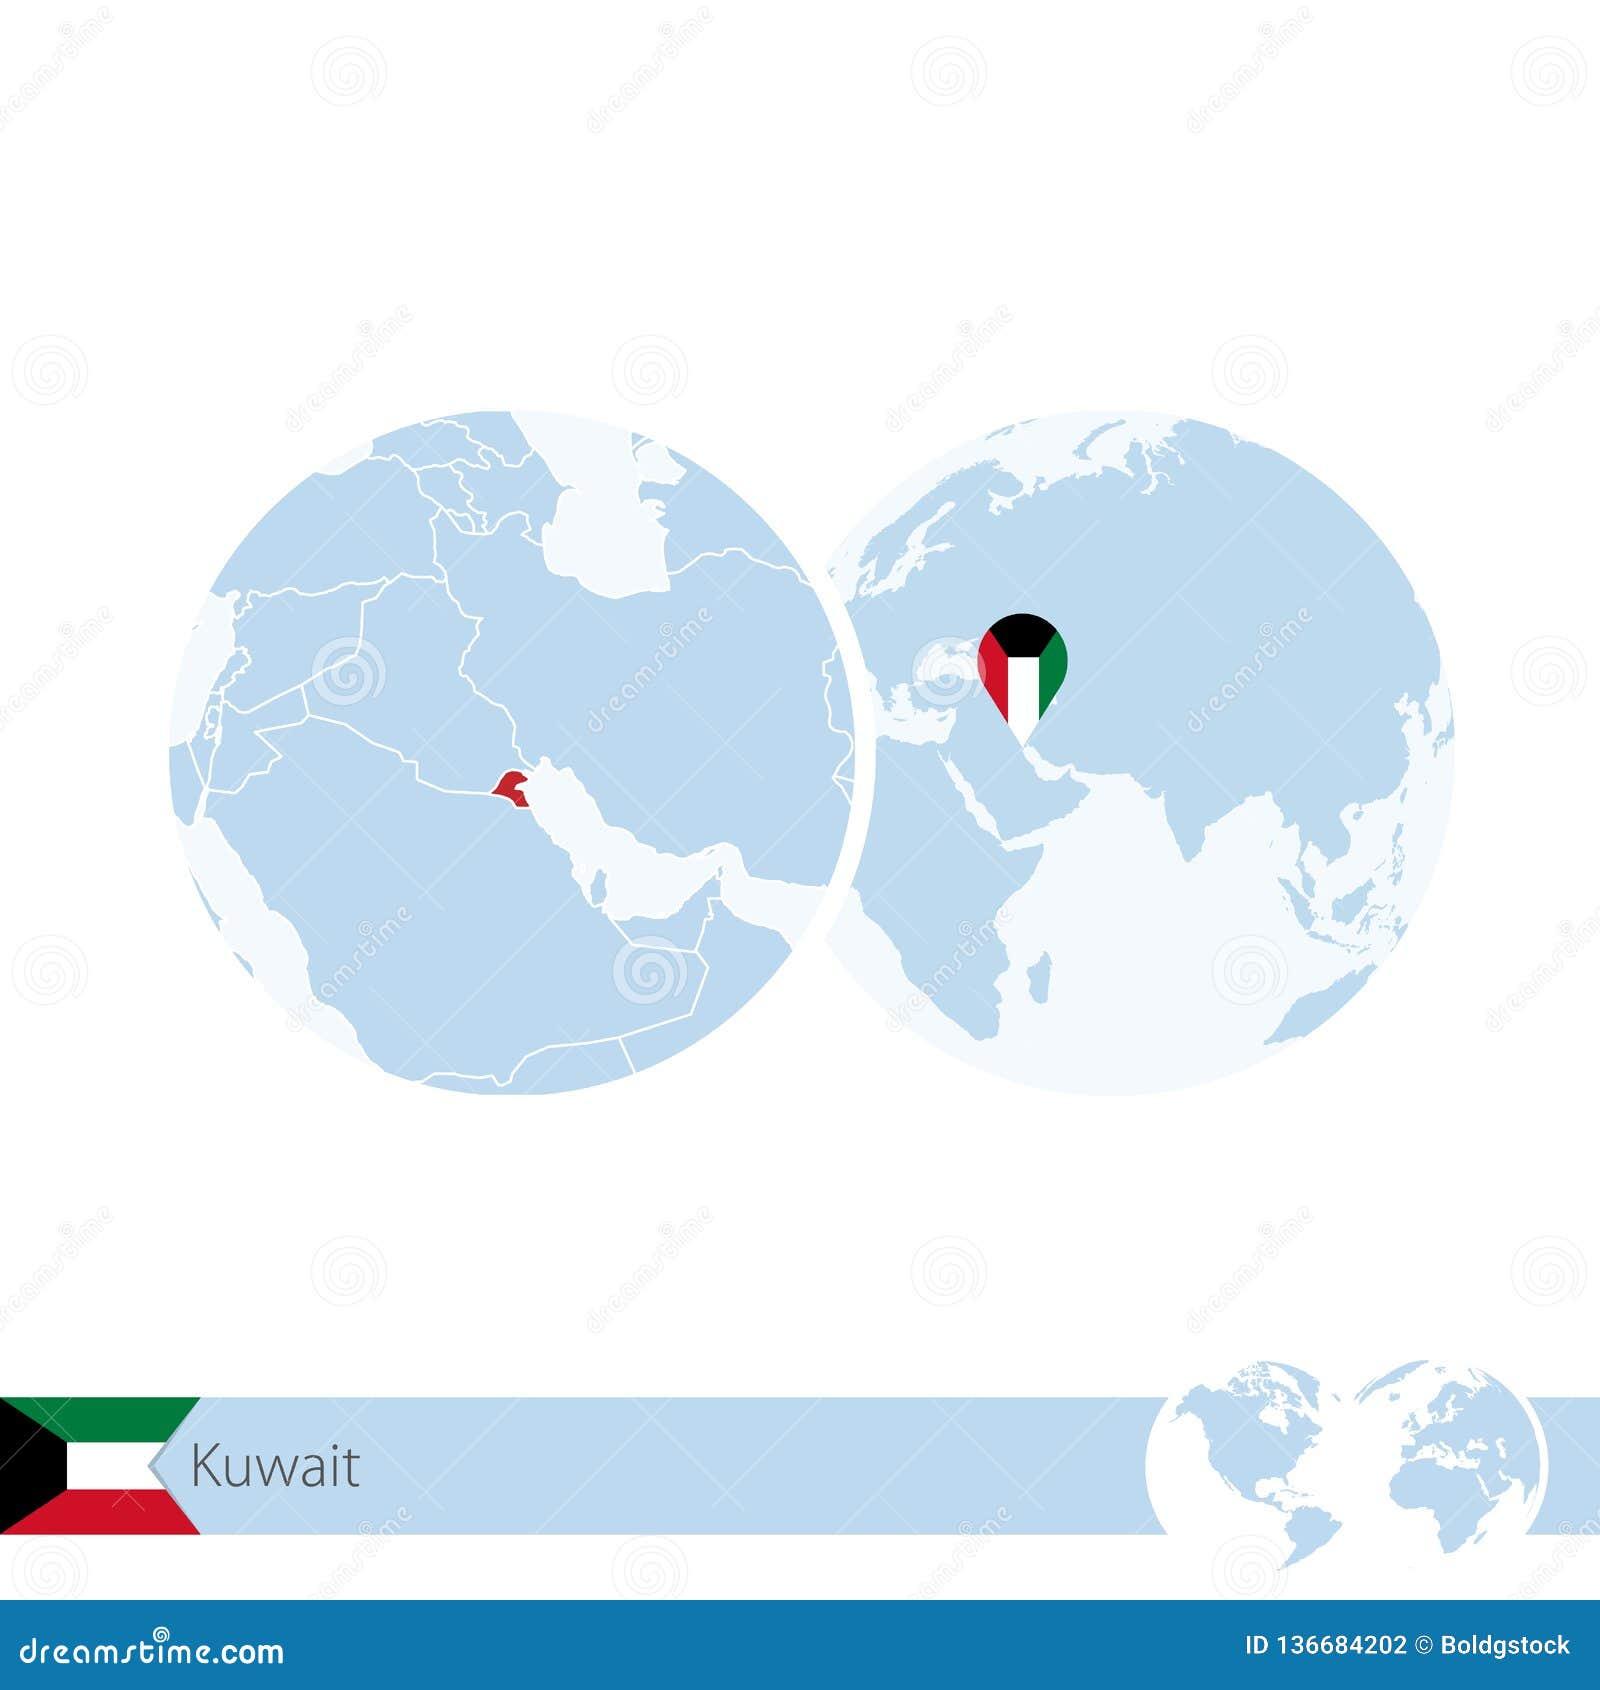 Kuwait On World Globe With Flag And Regional Map Of Kuwait Stock ...